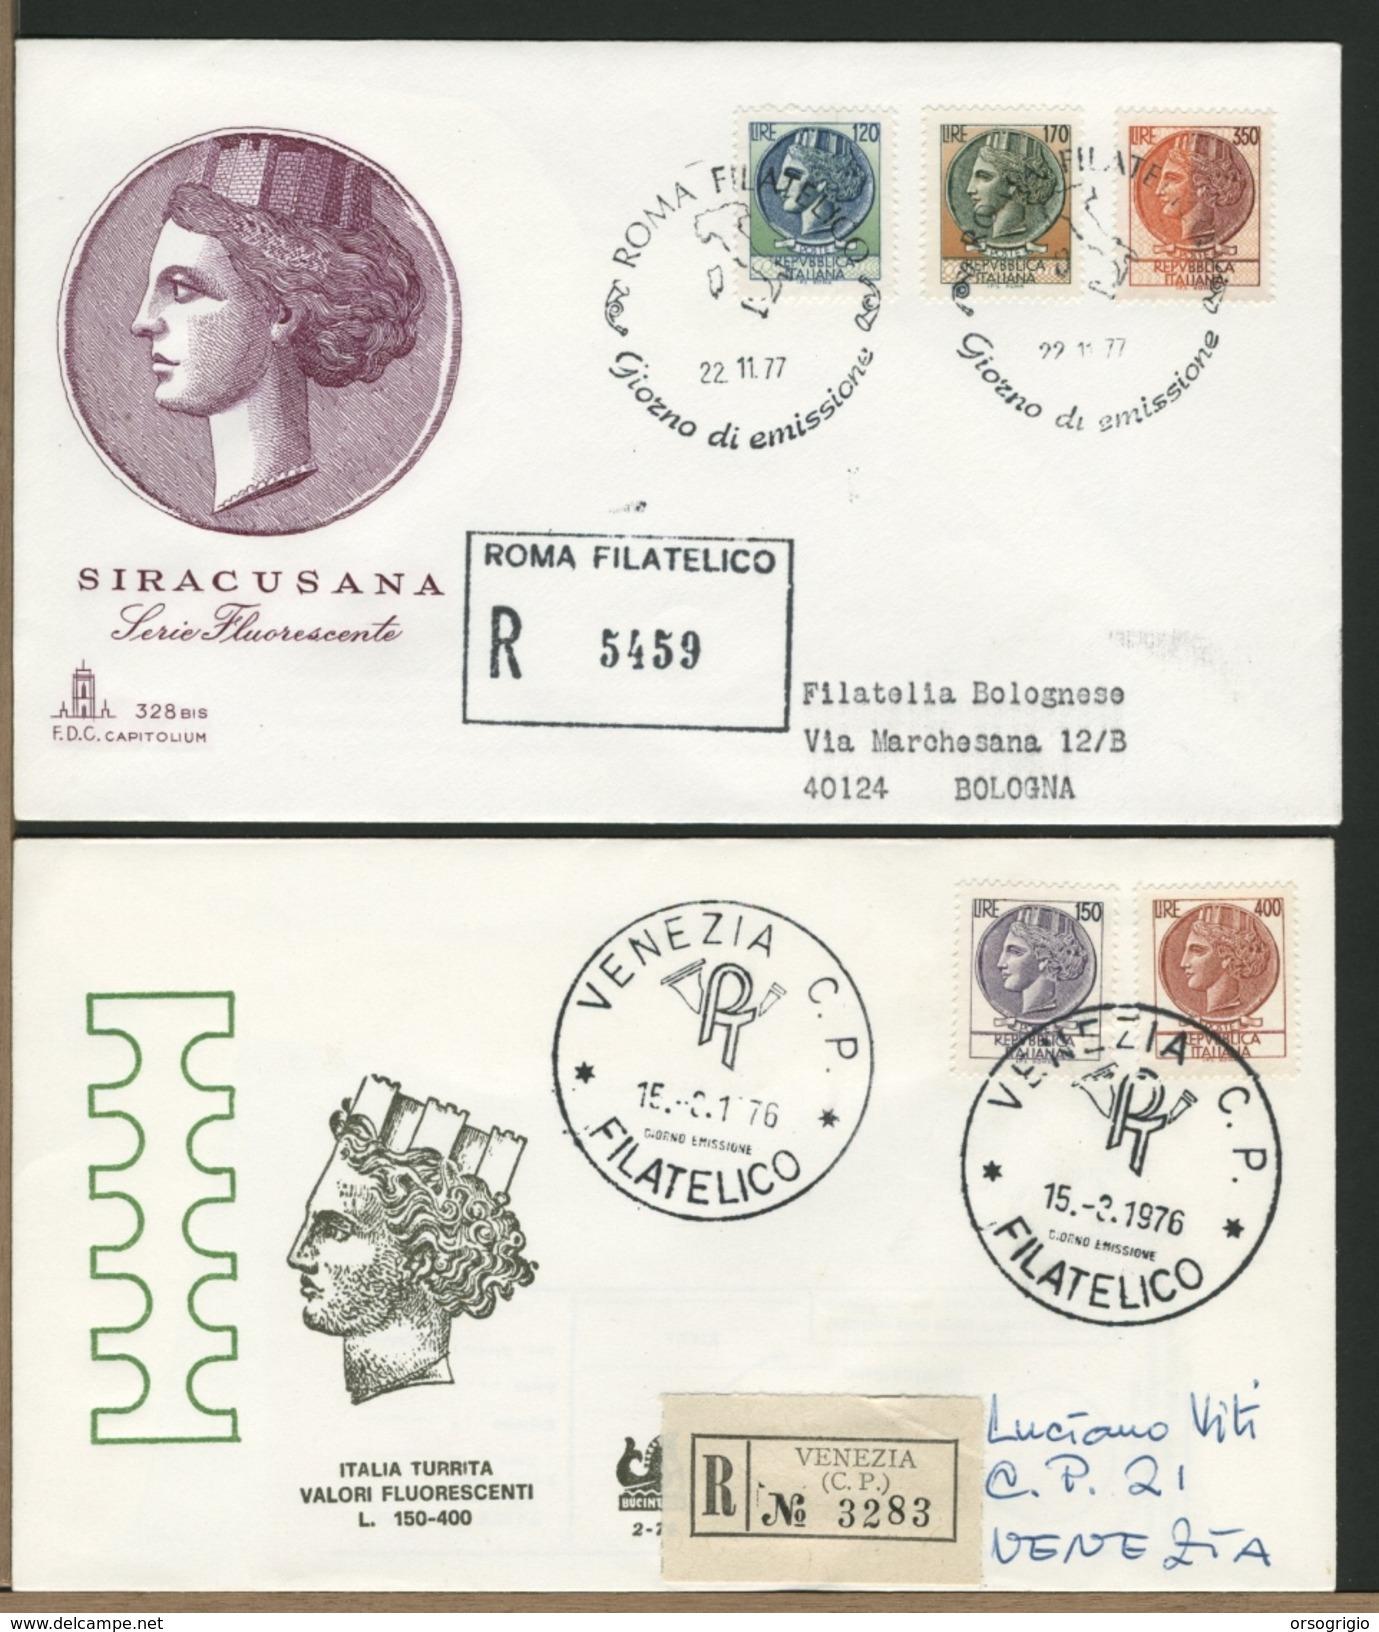 ITALIA - FDC -  SIRACUSANA  TURRITA  1977  1976  FLUORESCENTI - F.D.C.